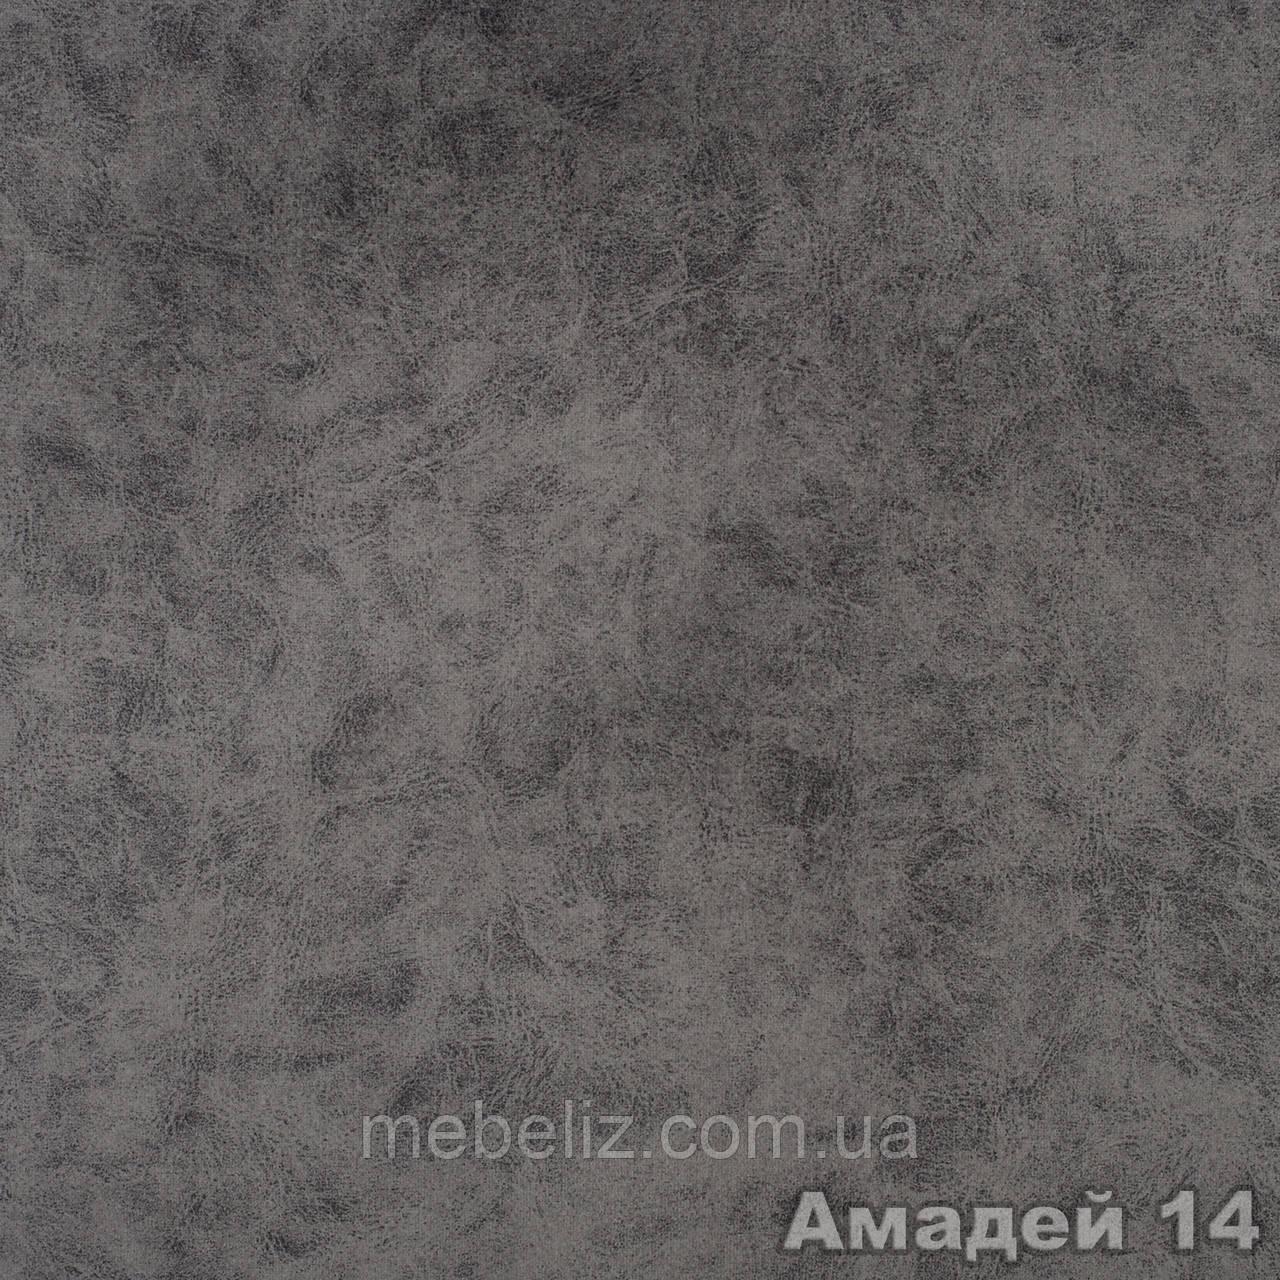 Тканина меблева для оббивки Амадей 14